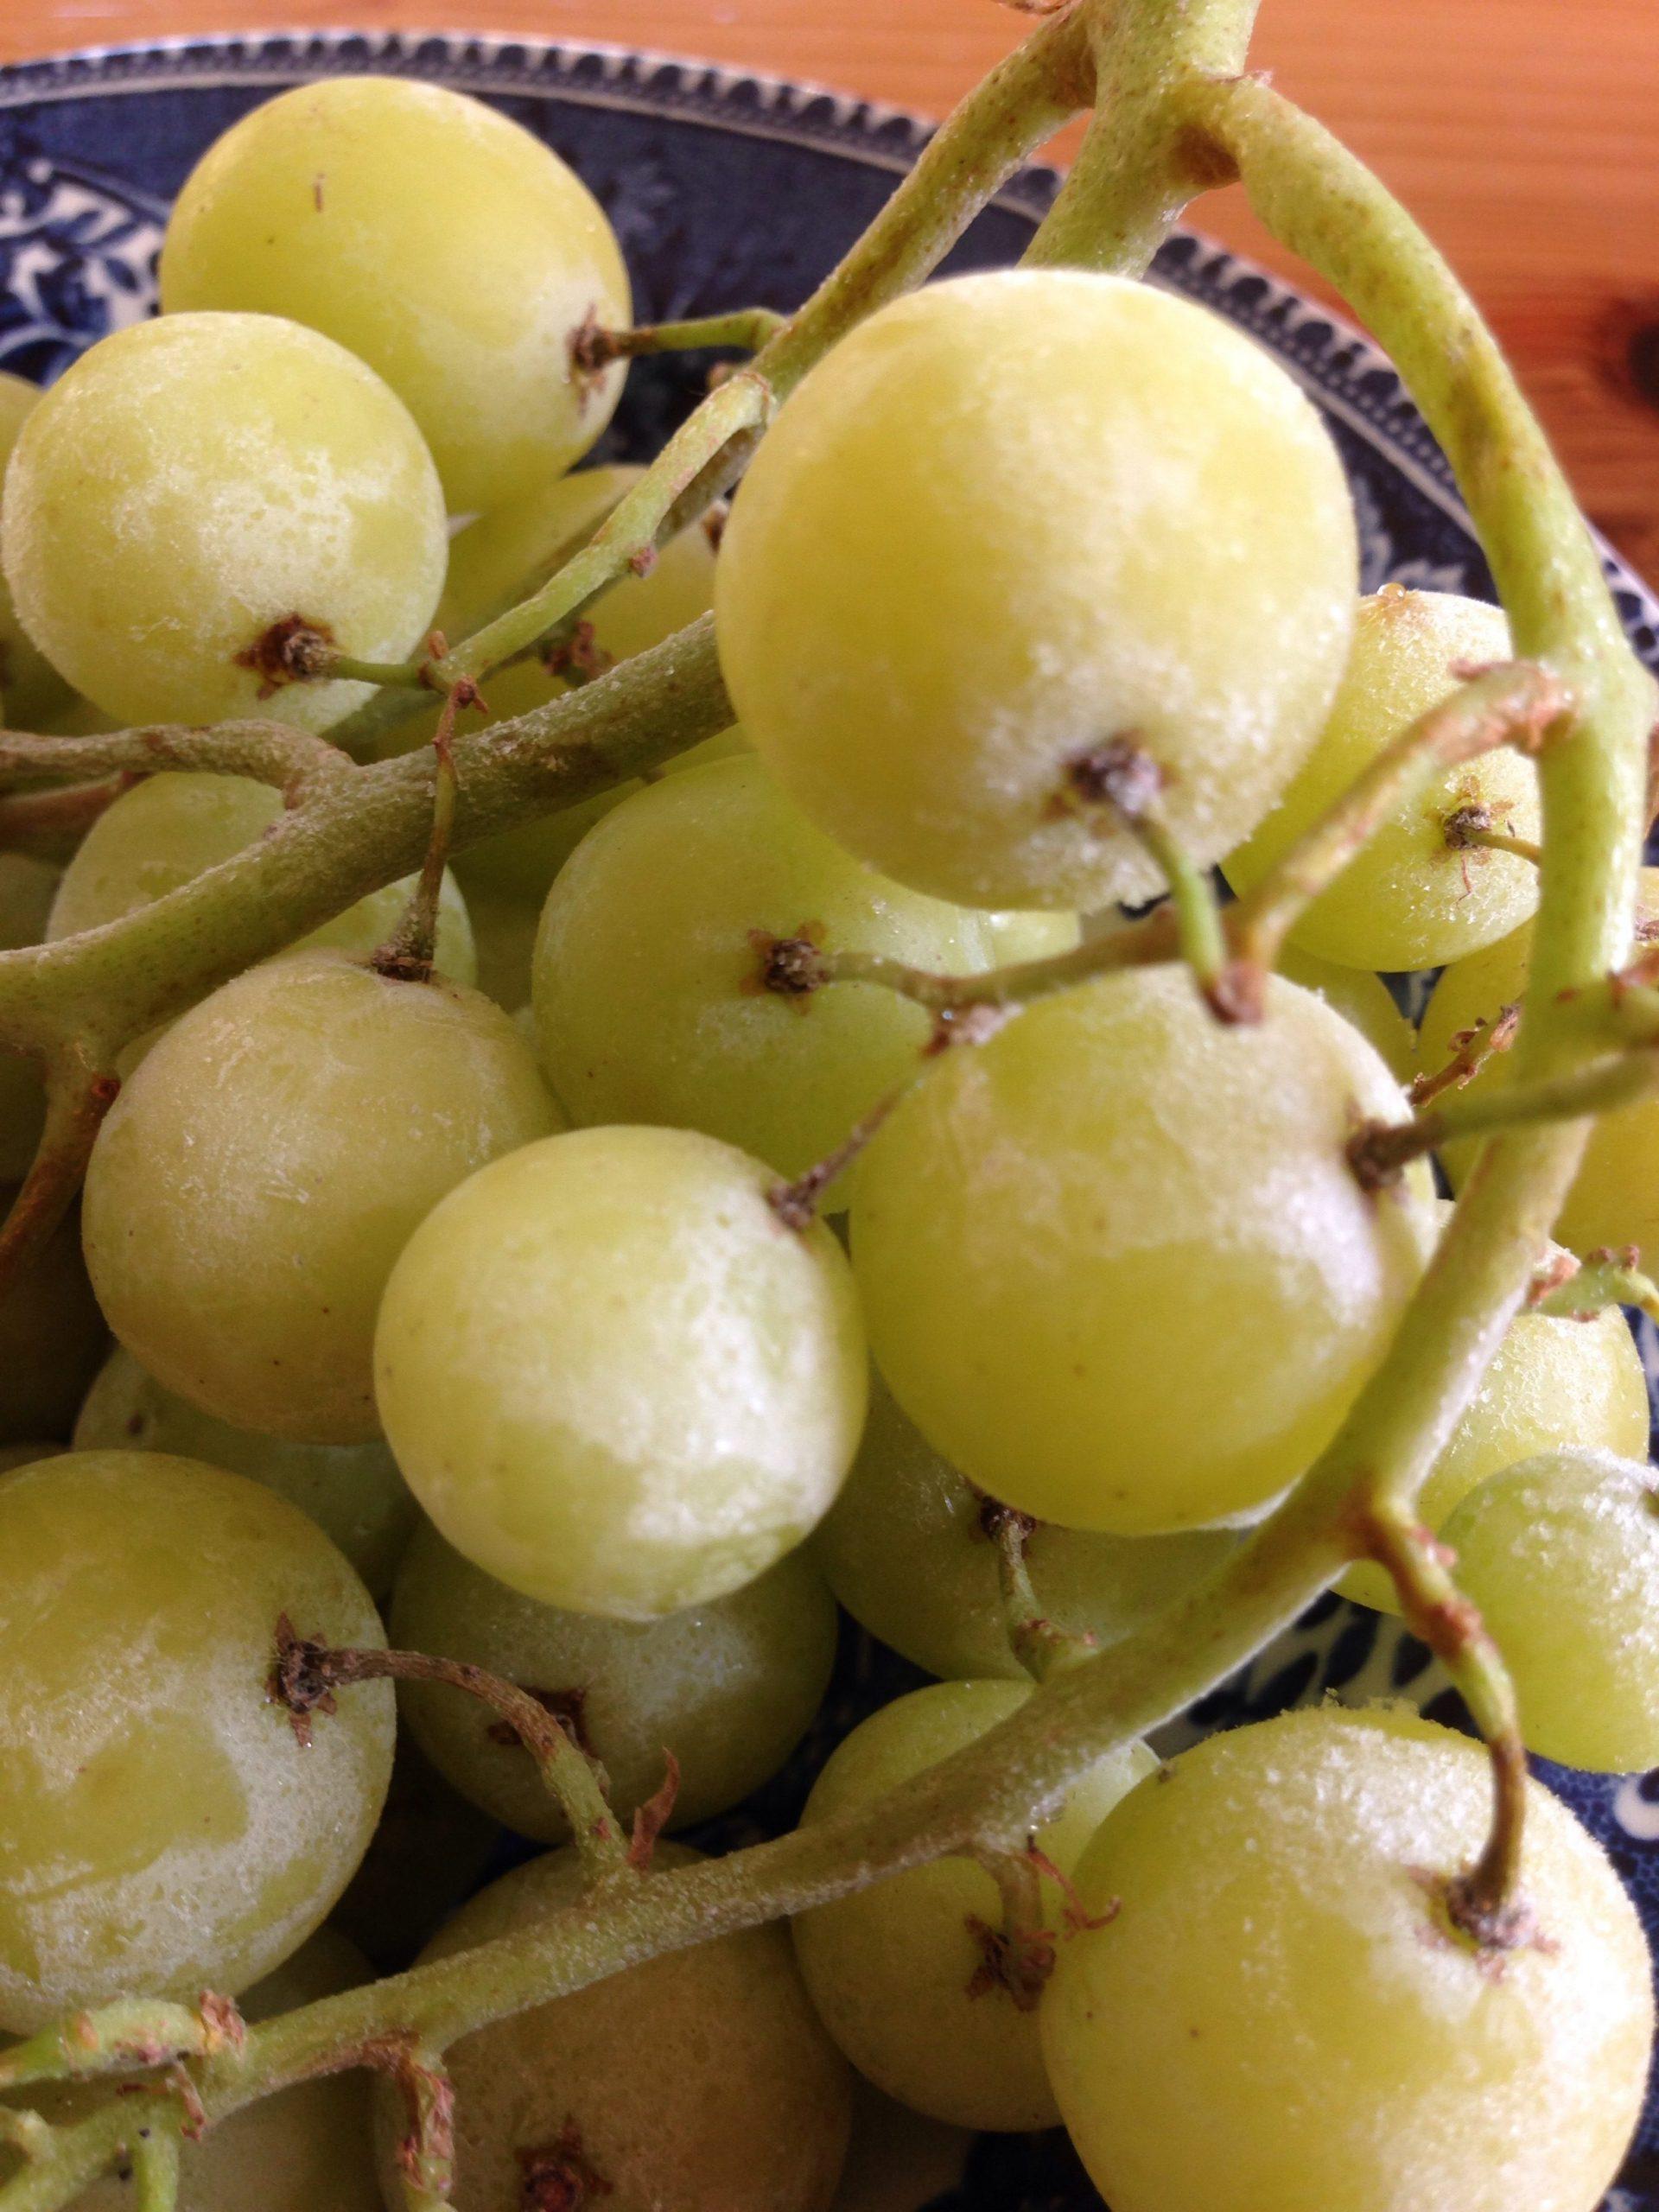 Kan man frysa vindruvor